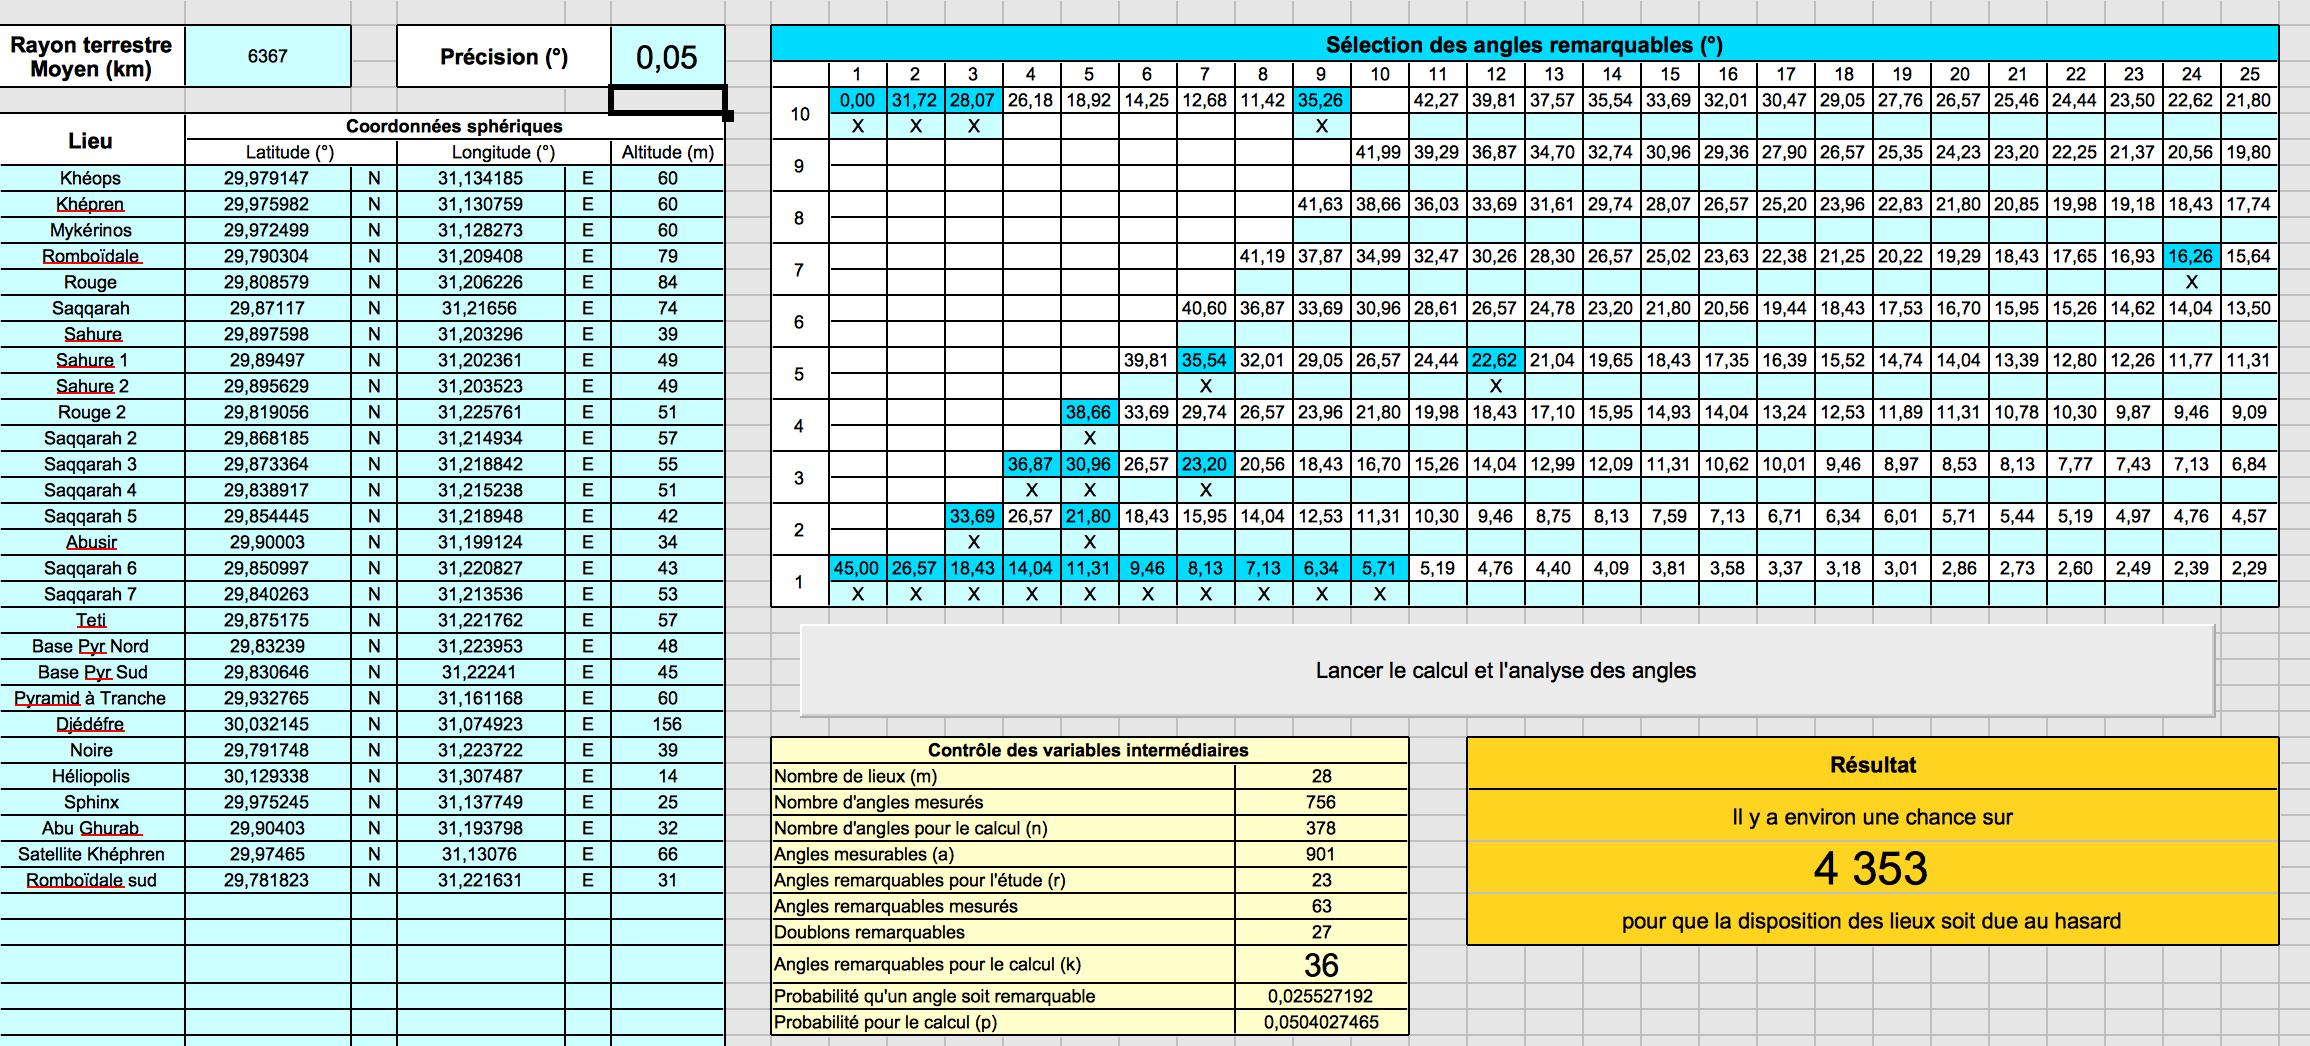 2017-11-14 22:28:58